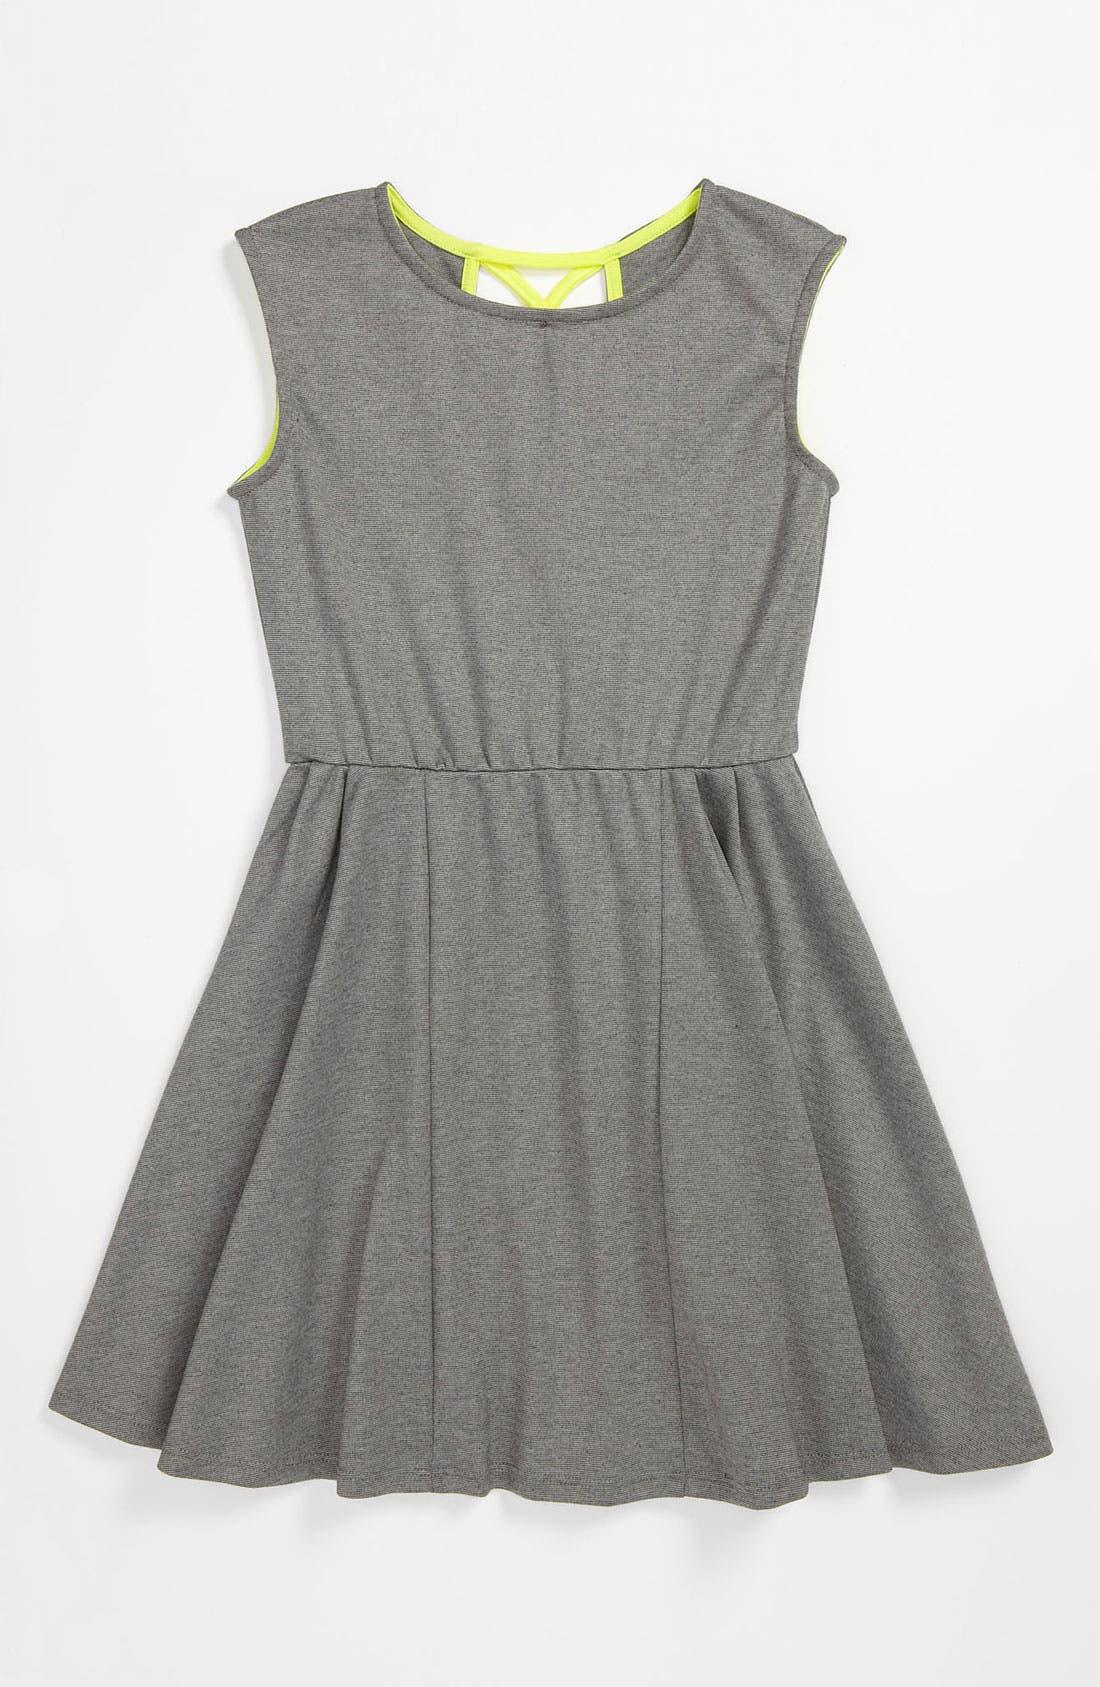 Alternate Image 1 Selected - W Girl Neon Trim Dress (Big Girls)